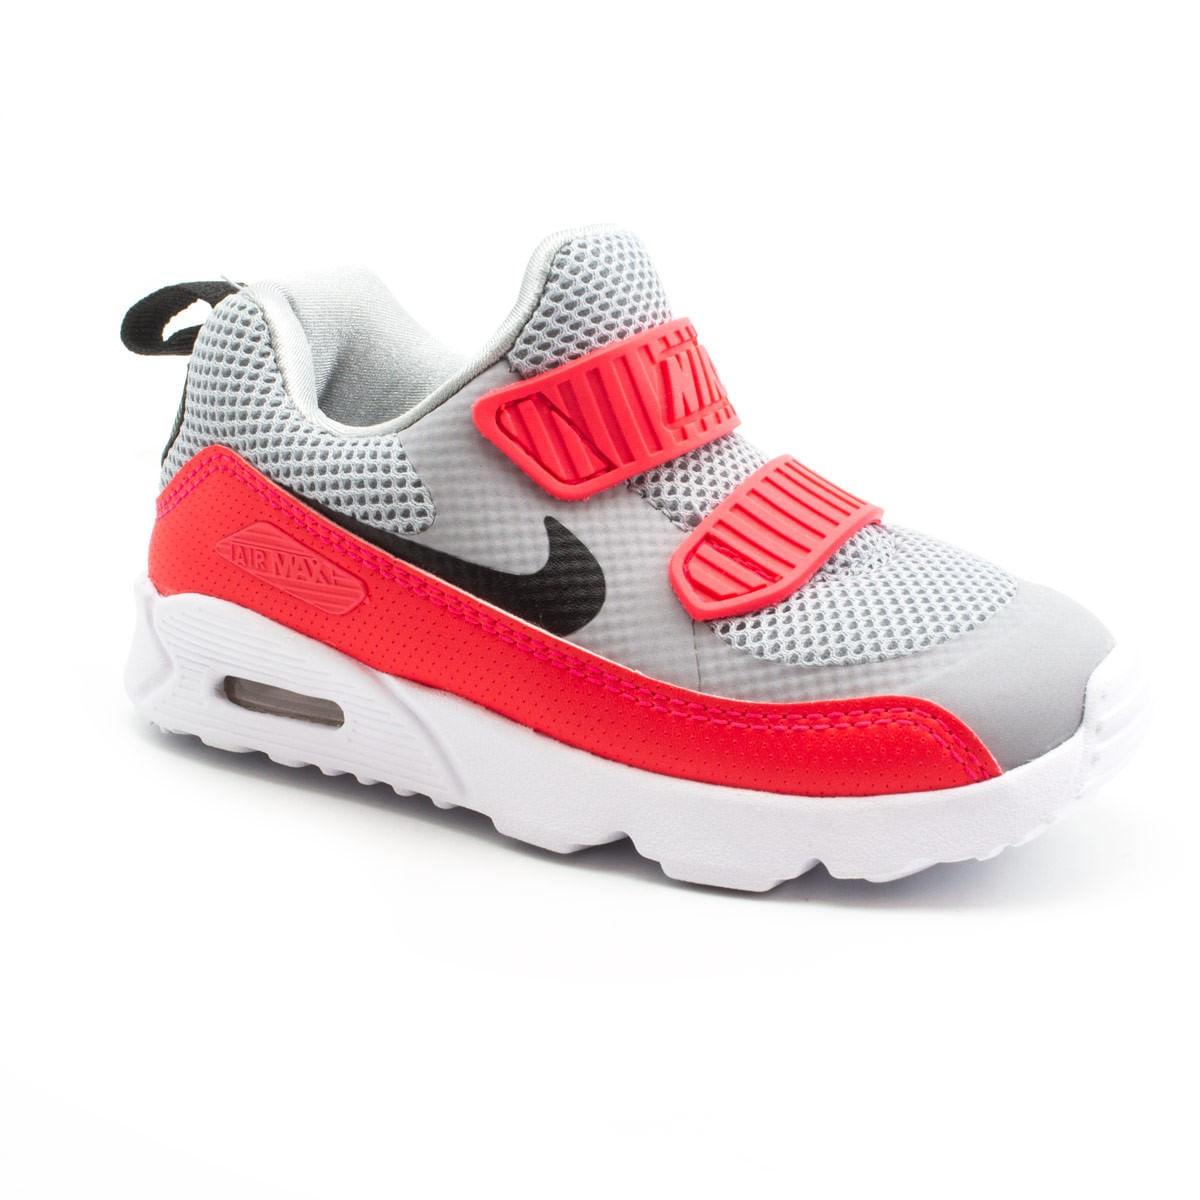 Tenis-Infantil-Nike-Air-Max-Tiny-90--20-ao-26-